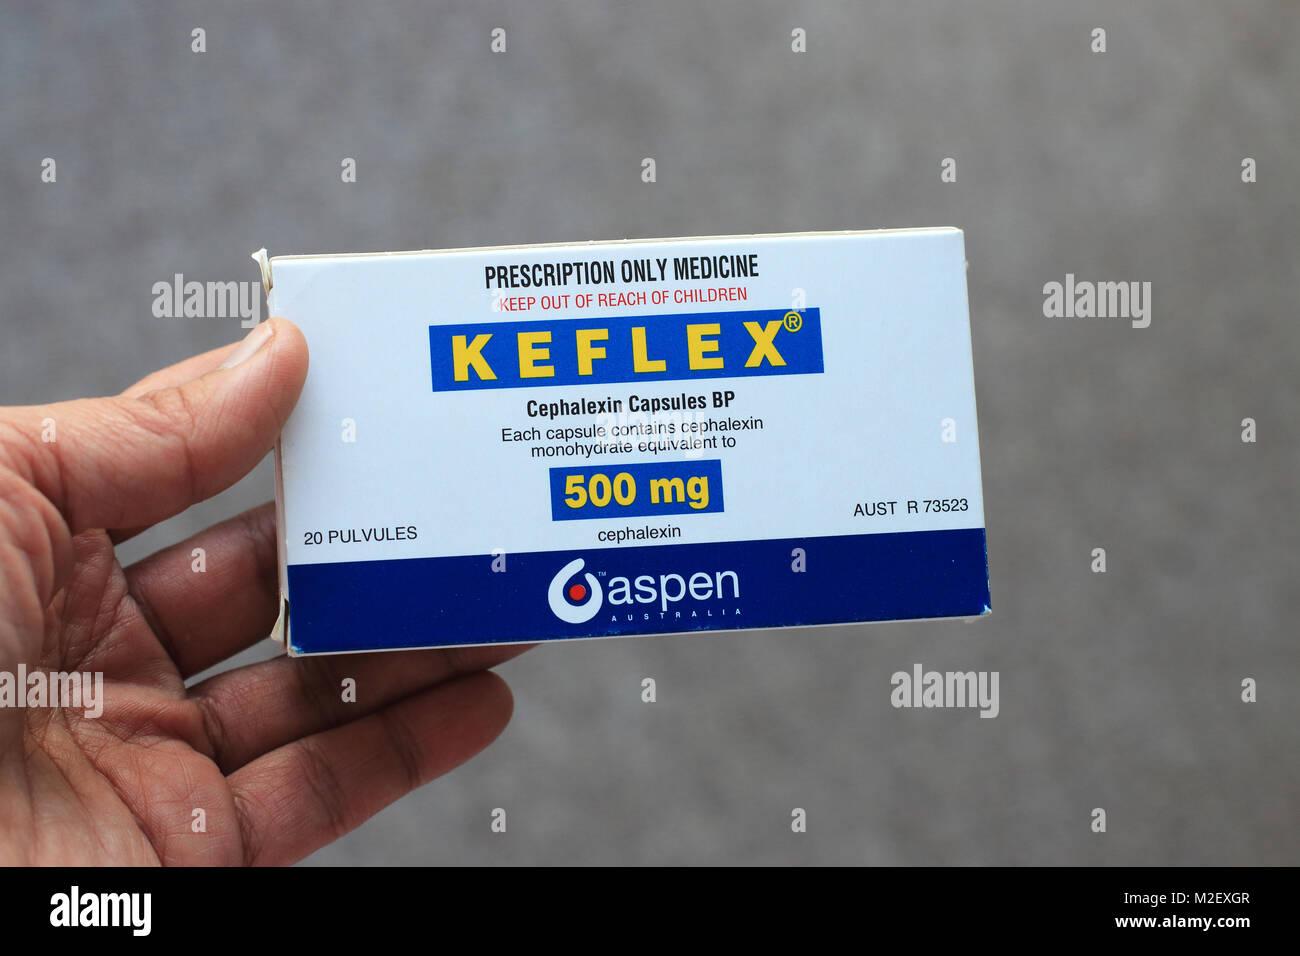 Keflex Cephalexin Capsules Keflex Cephalexin Capsules - Stock Image